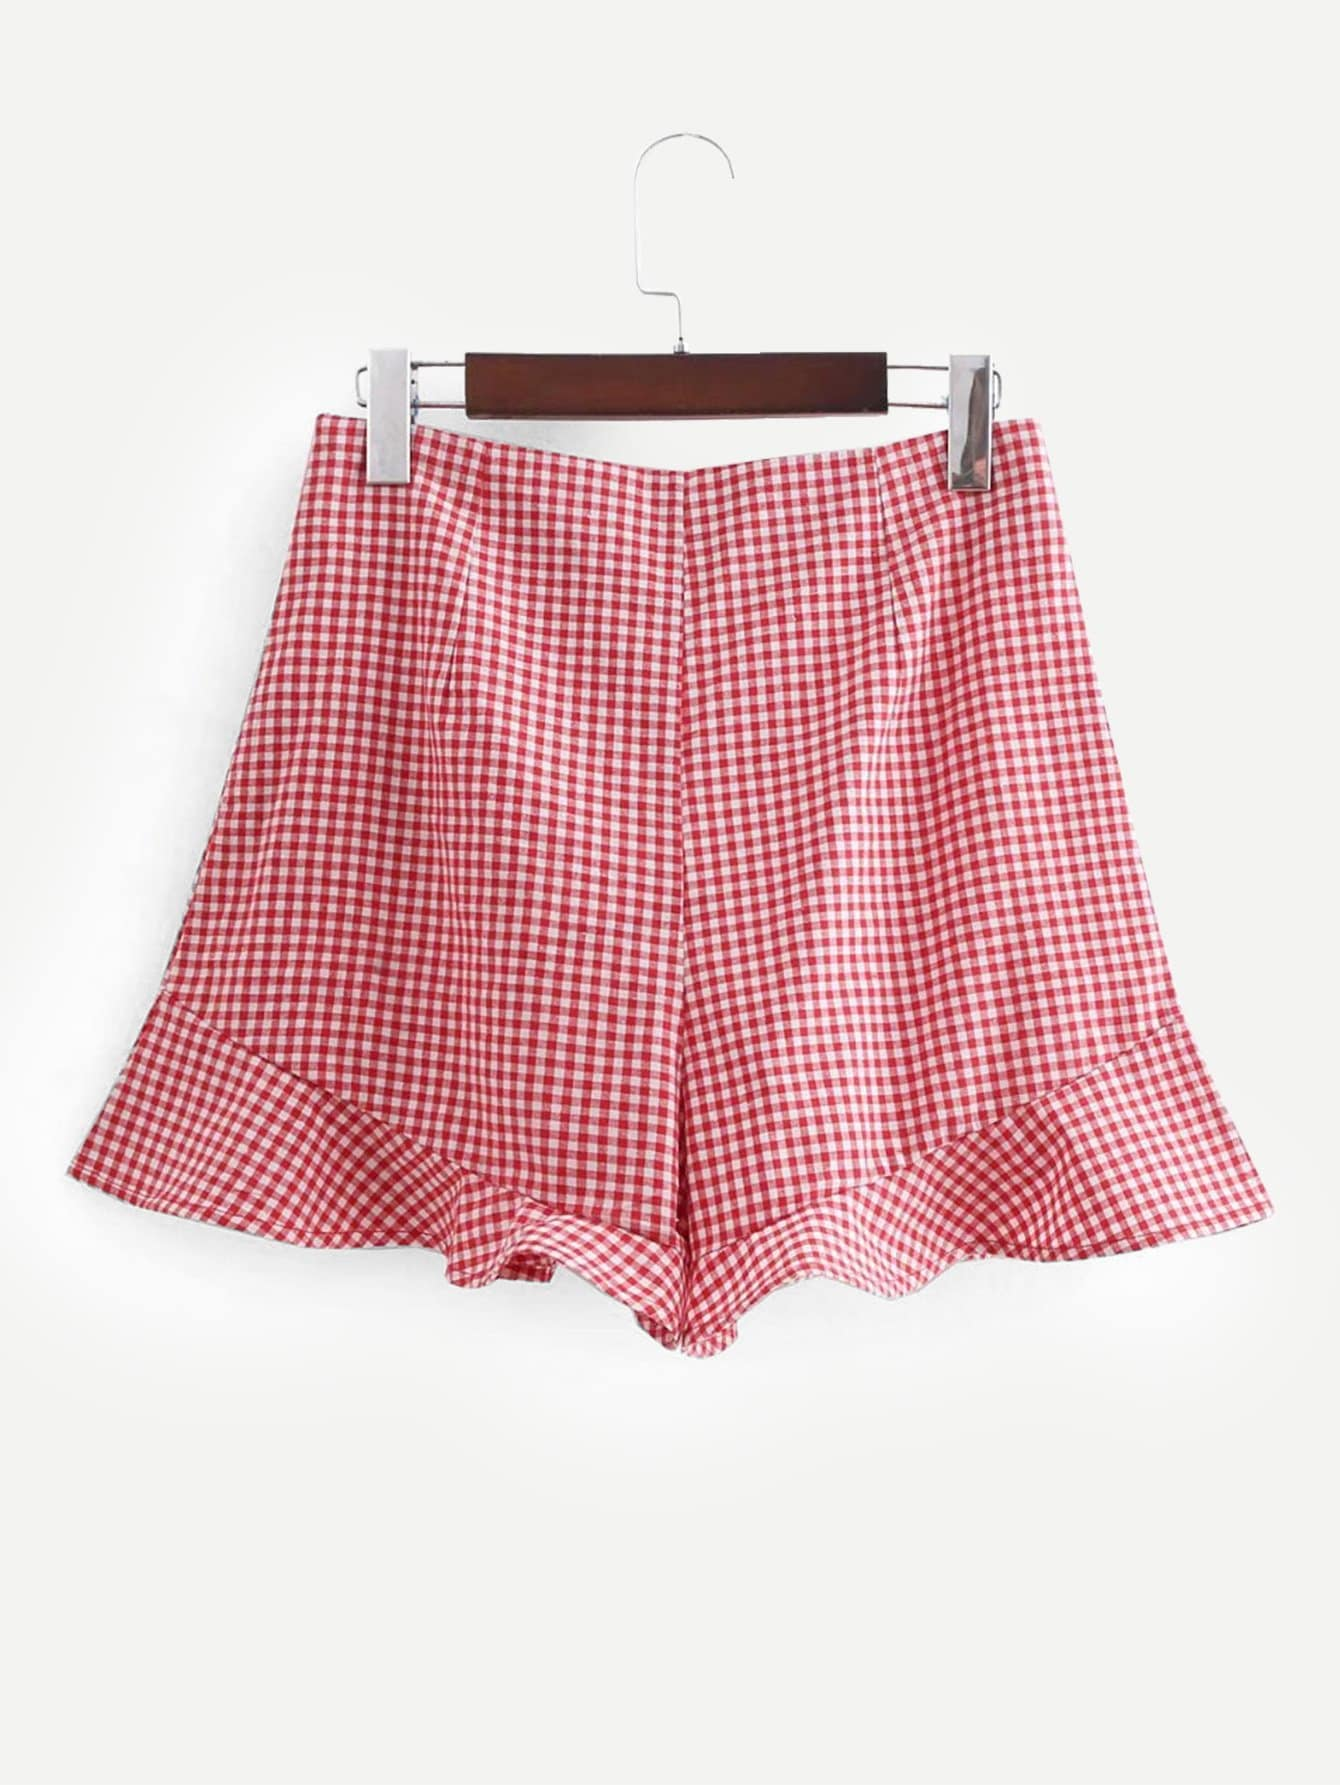 Ruffle Hem Gingham Shorts ruffle hem solid shorts